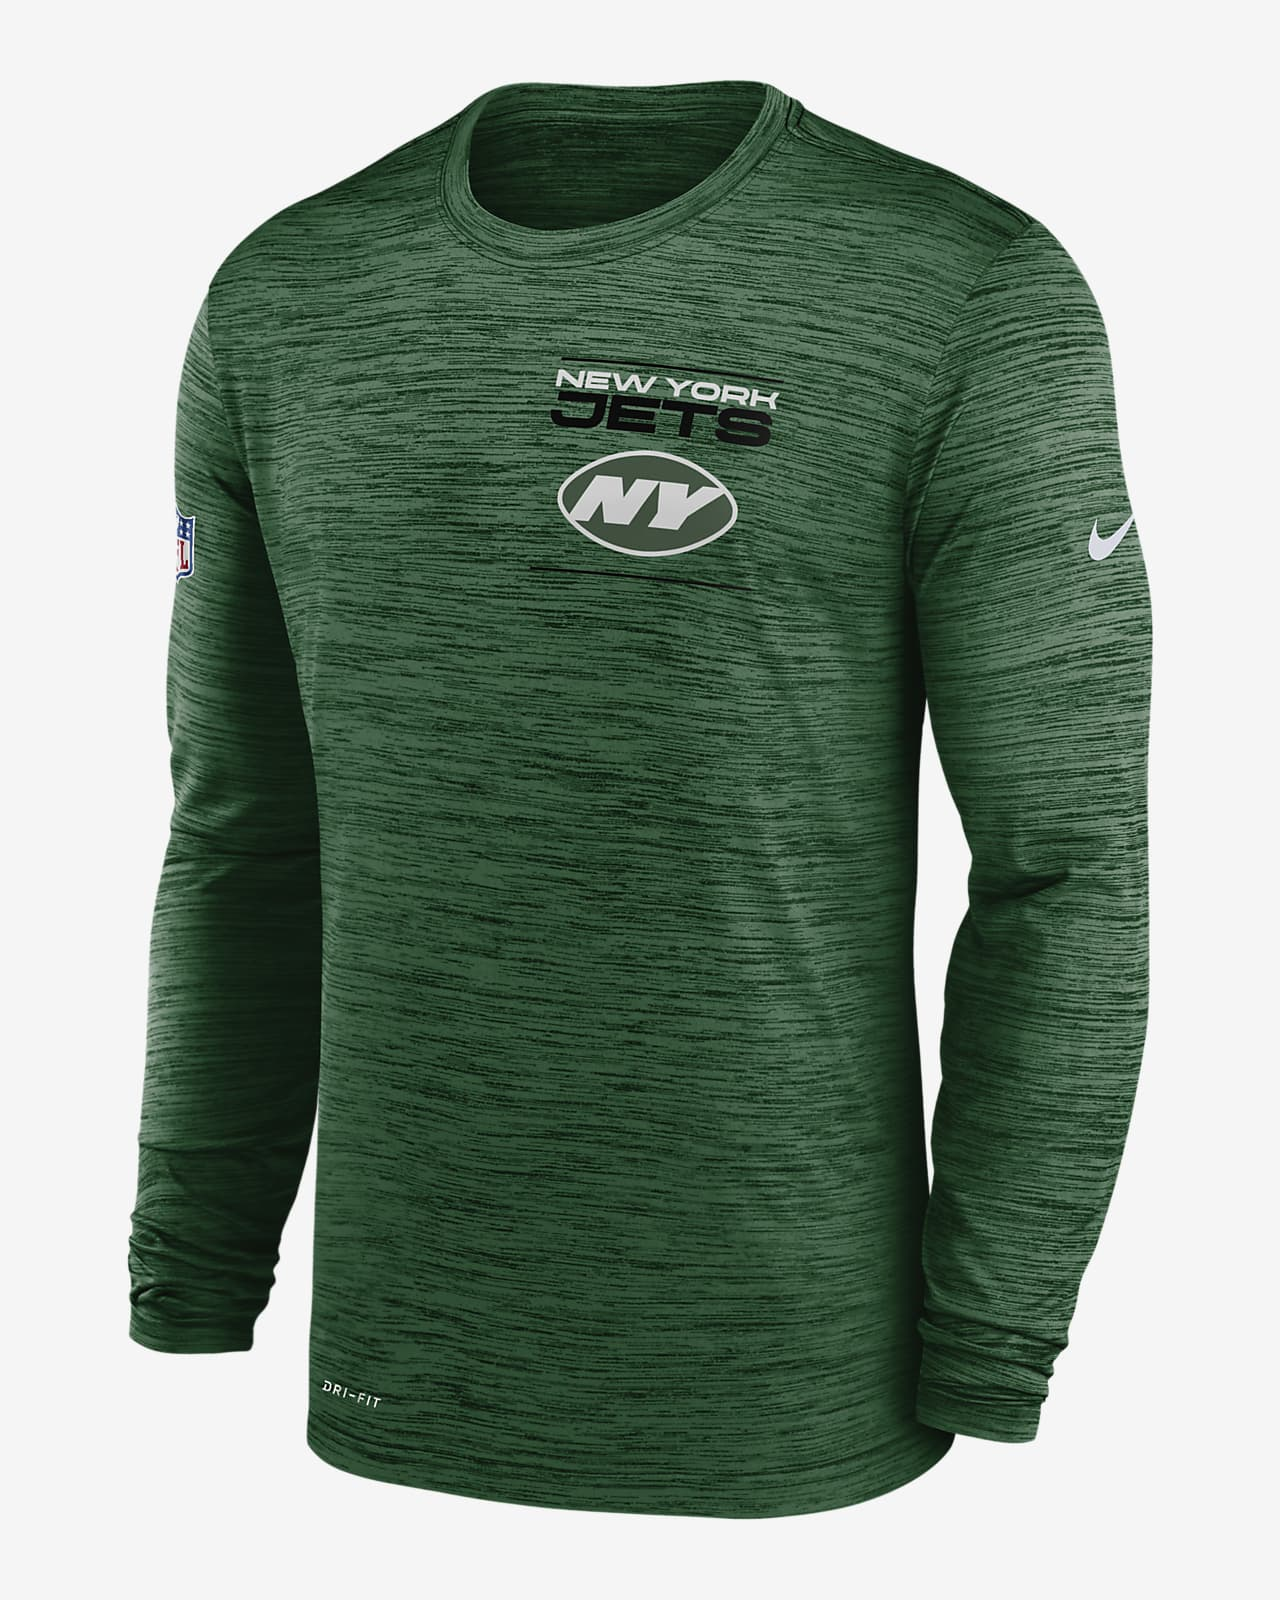 Nike Dri-FIT Sideline Velocity Legend (NFL New York Jets) Men's Long-Sleeve T-Shirt